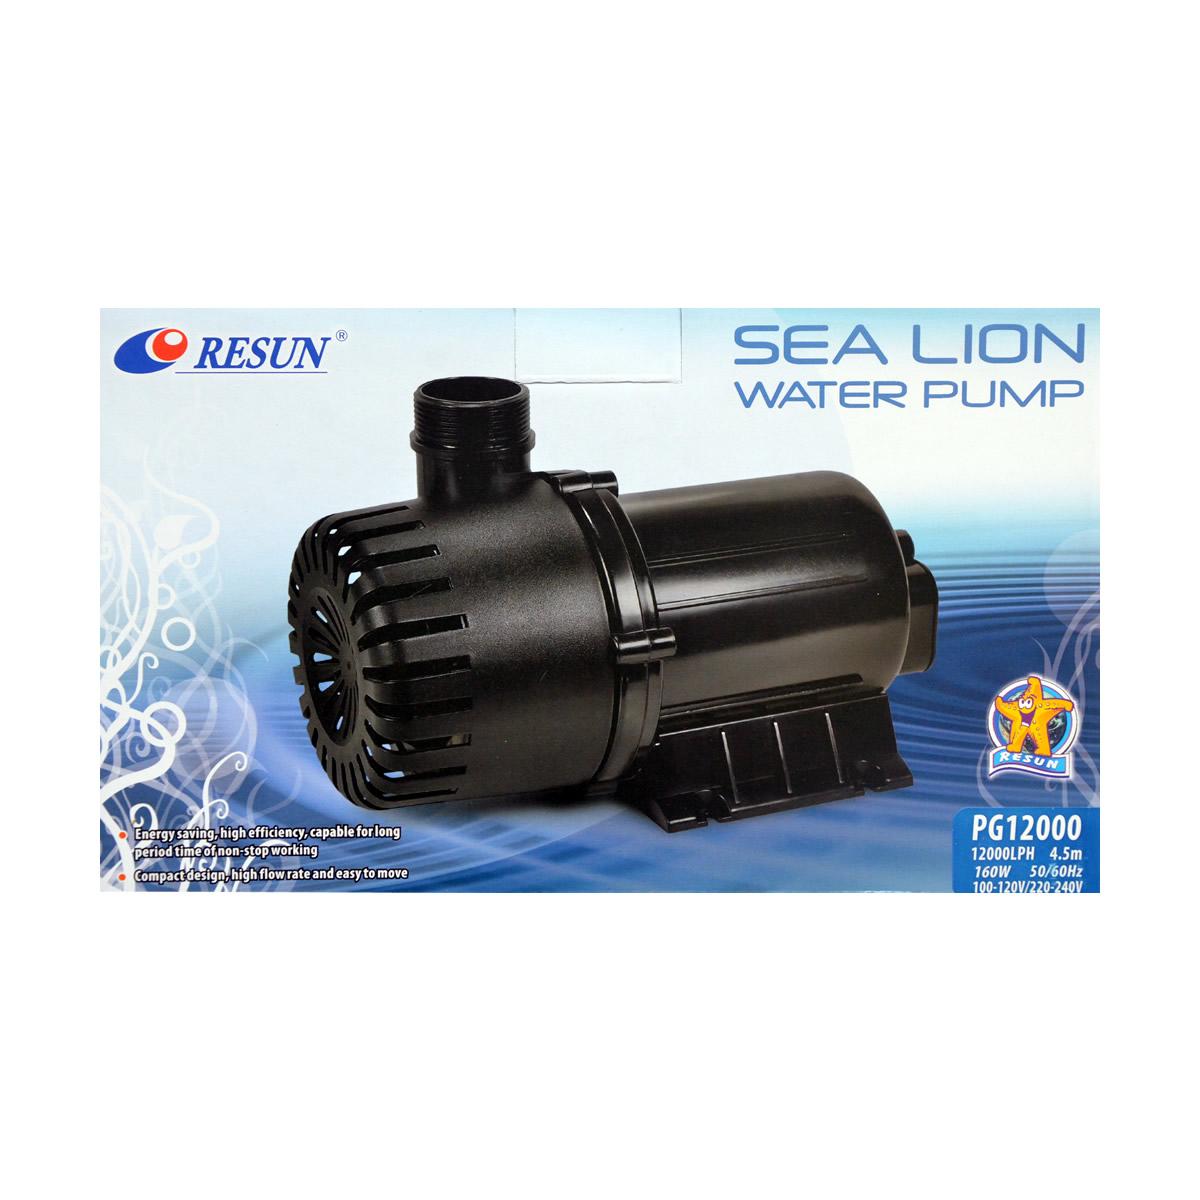 ReSun PG12000 Sea Lion Pond Circulation Water Pump 160W 12000L/H